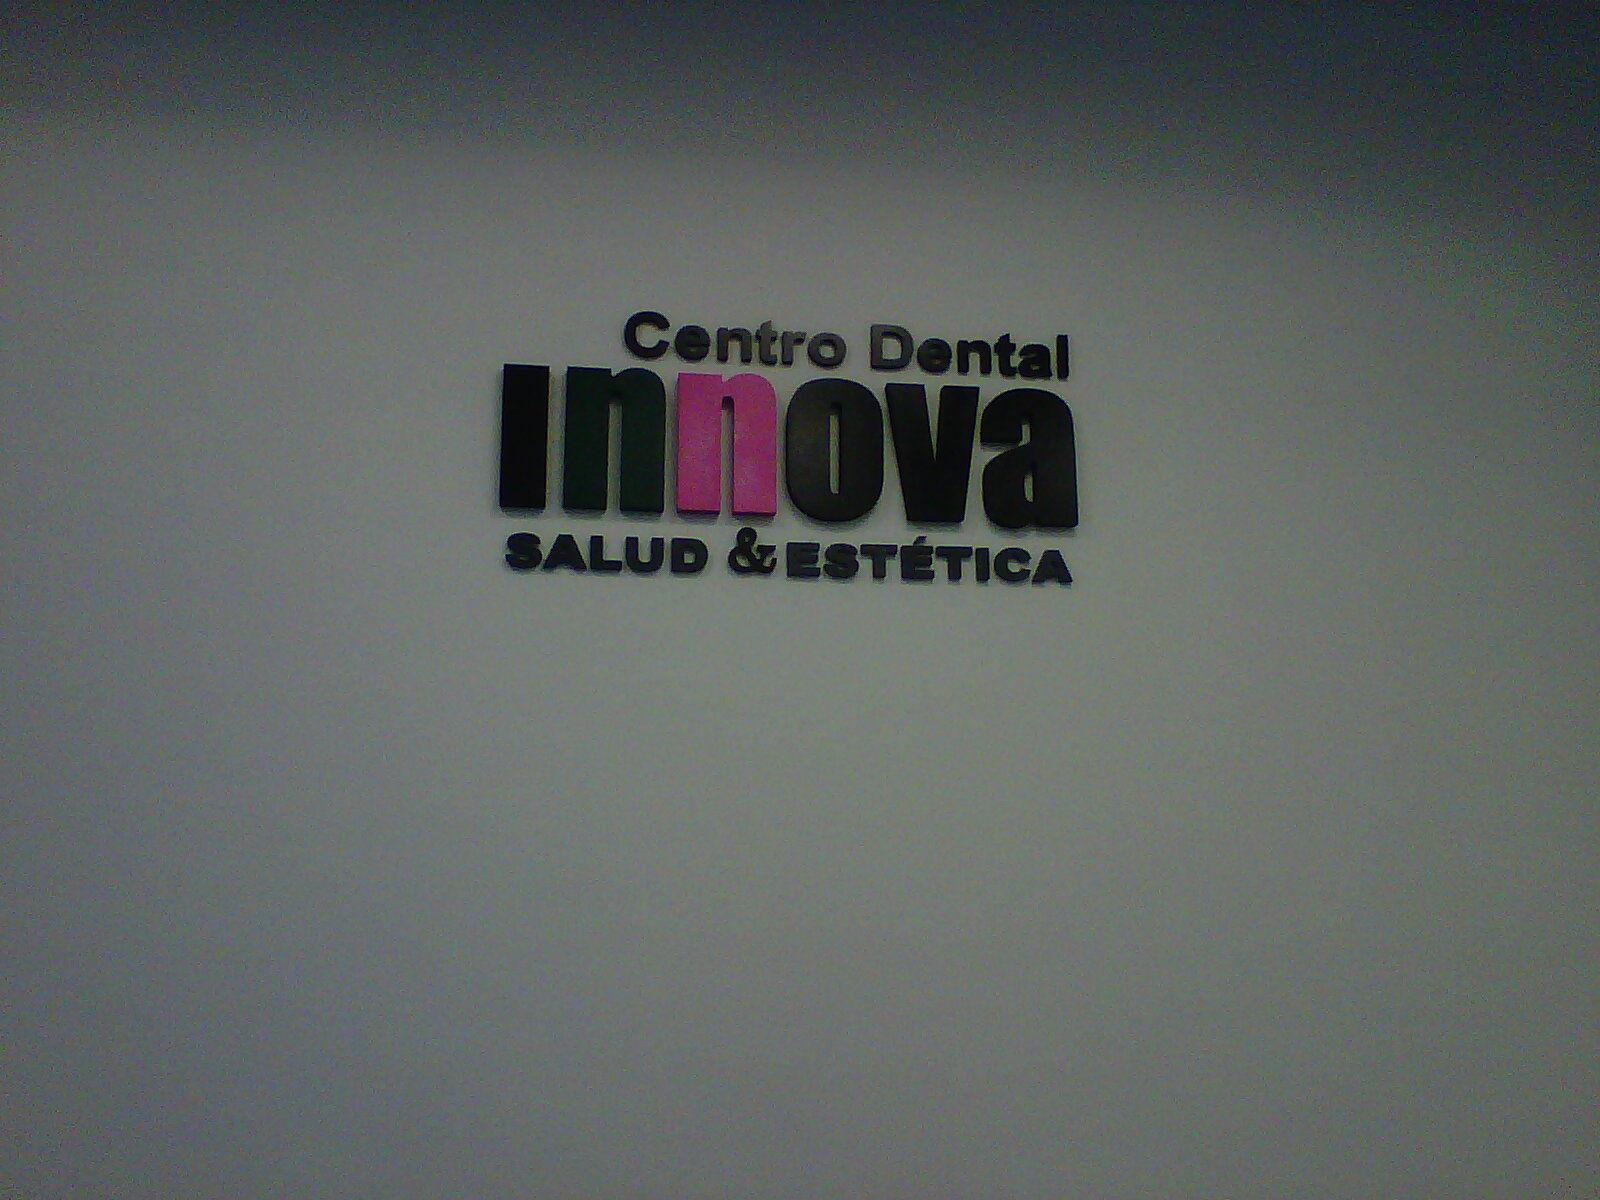 Foto 22 de Dentistas en Avilés   Centro Dental Innova